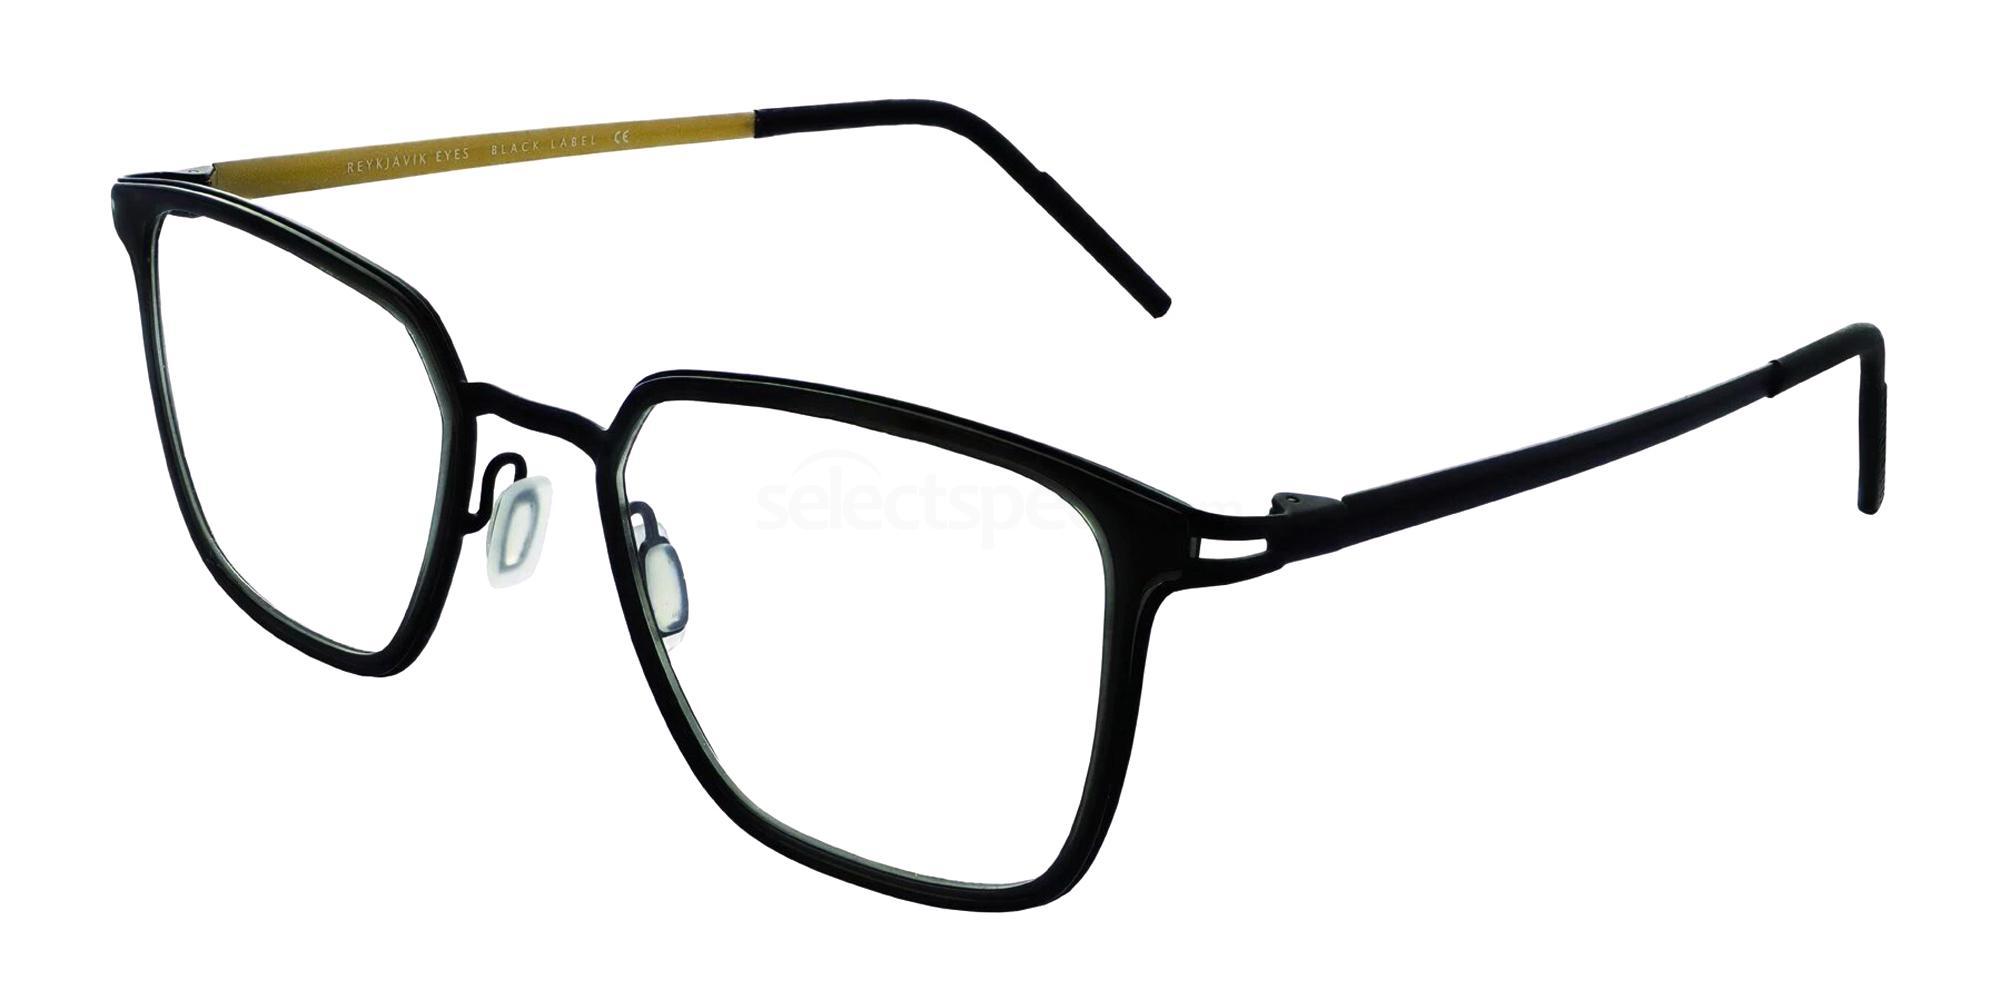 C1 MARKUS Glasses, Reykjavik Eyes Black Label